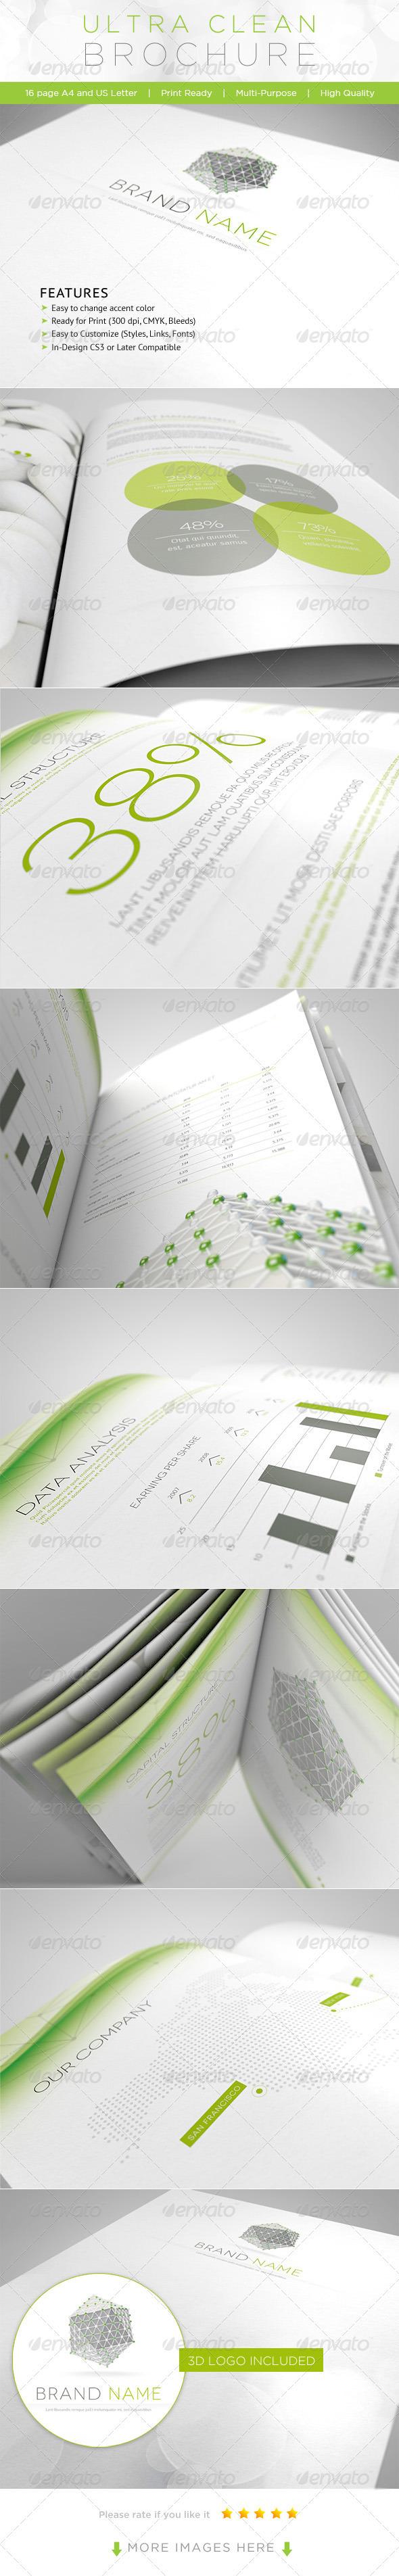 GraphicRiver Ultra Clean Brochure 1708031